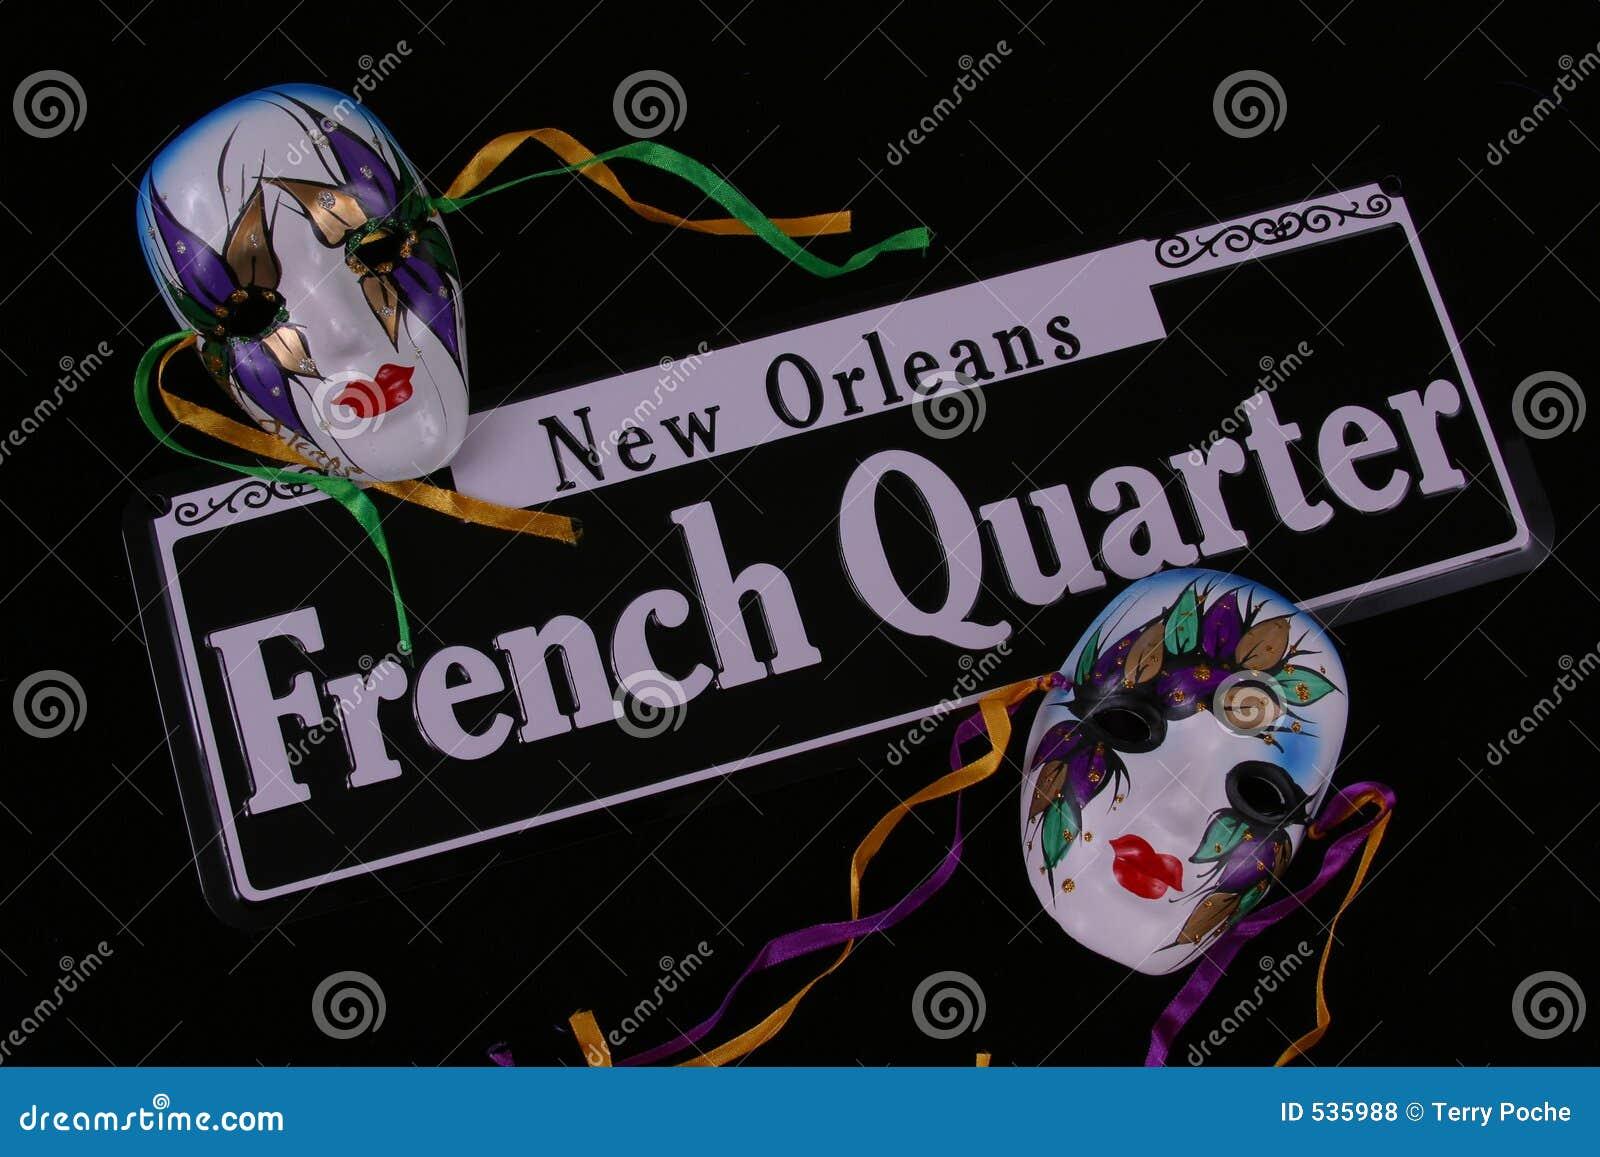 Bairro francês e duas máscaras